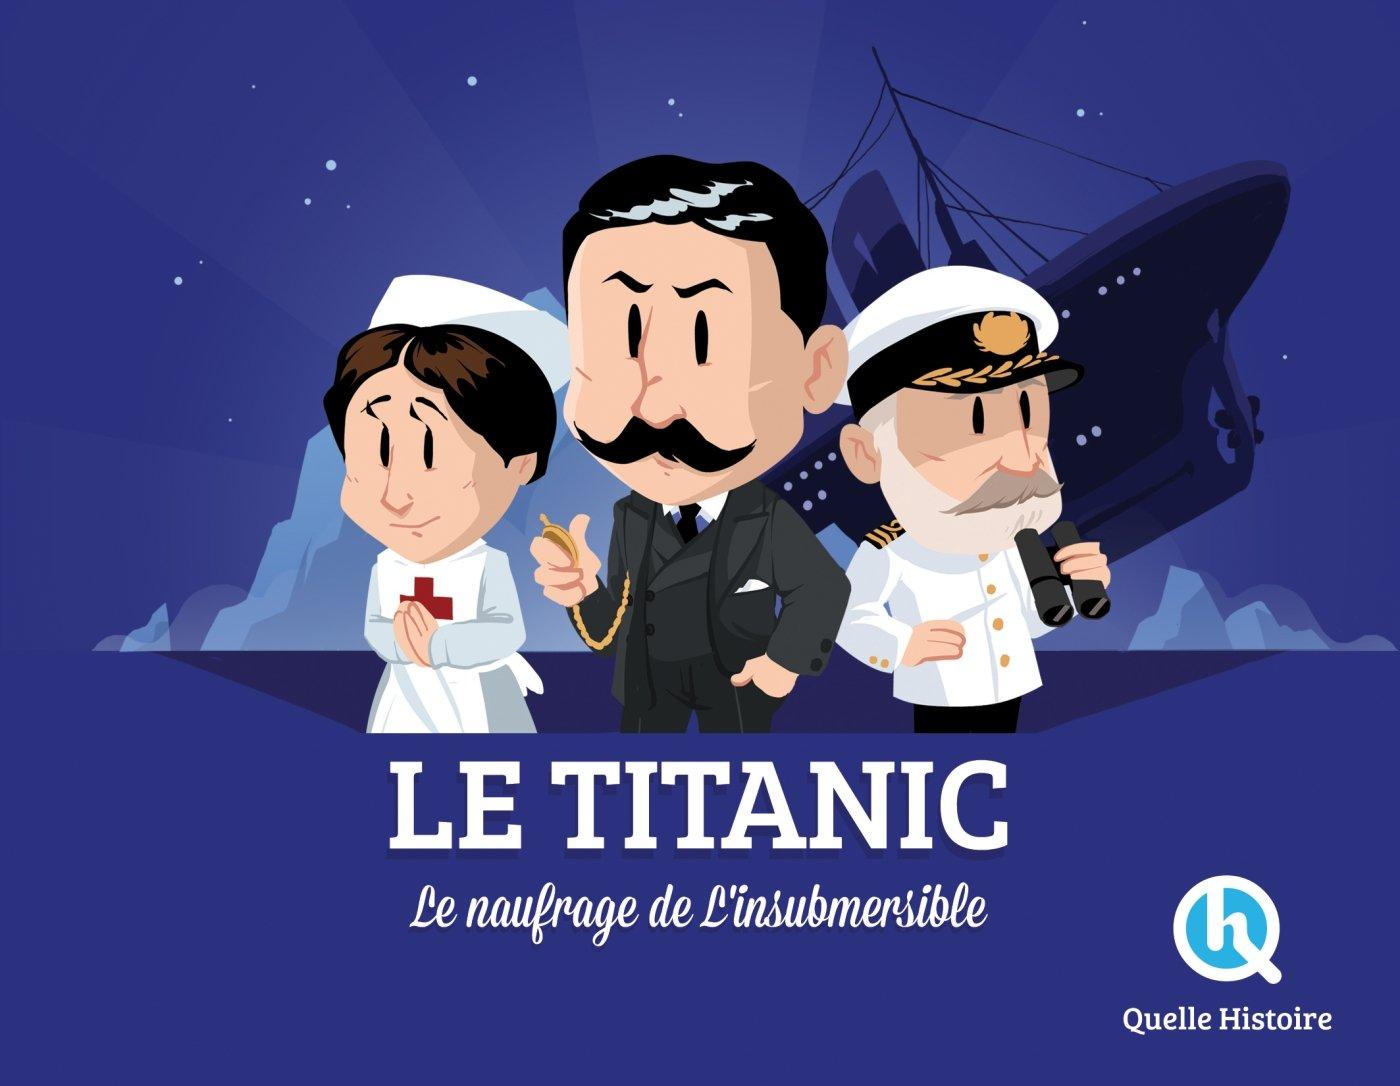 L'histoire du Titanic Album – 4 avril 2018 Claire L' Hoër L' histoire du Titanic Quelle Histoire Editions 2371044288